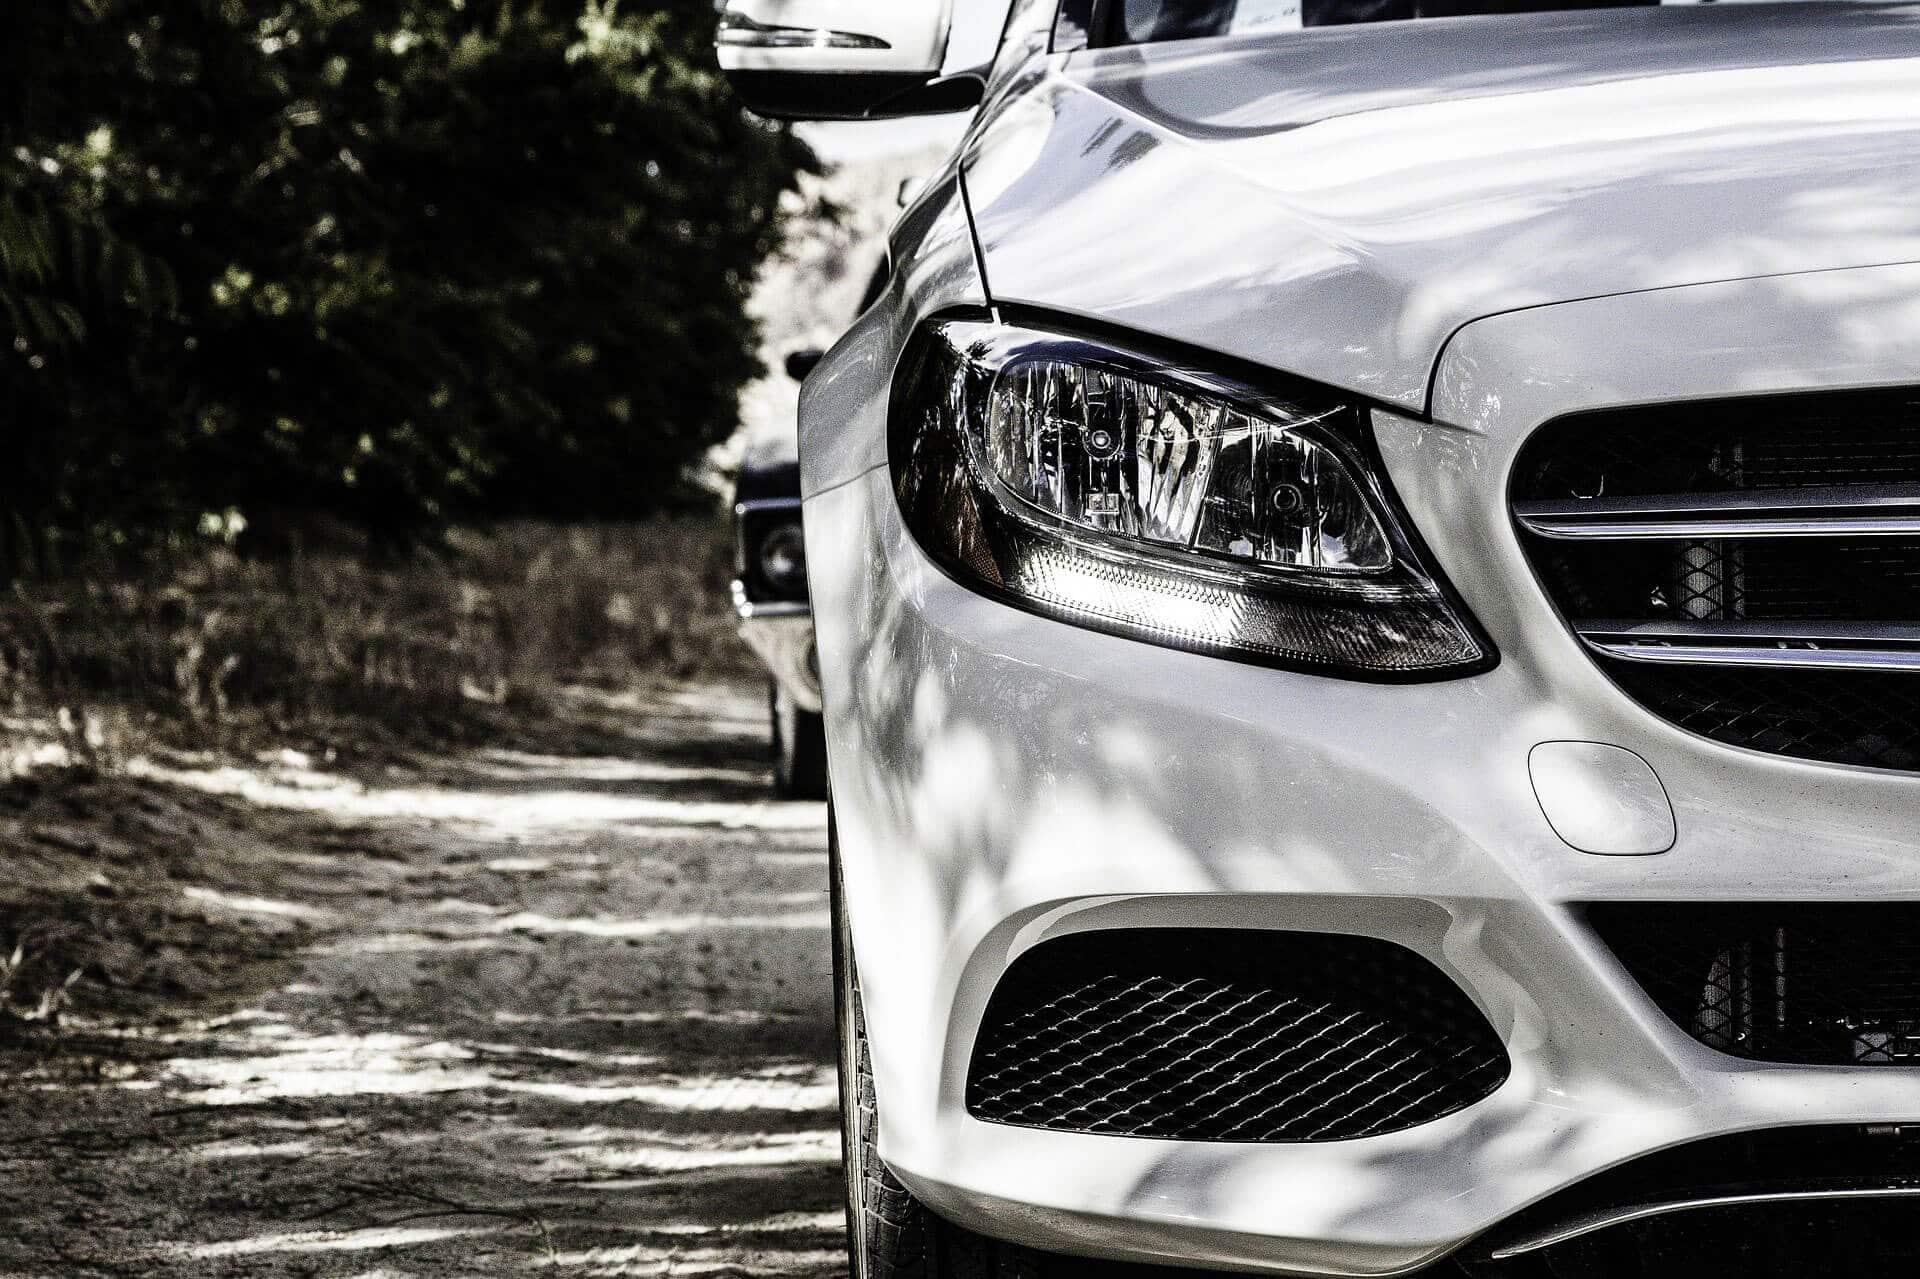 El Automóvil: ¿Alquilar o Comprar?